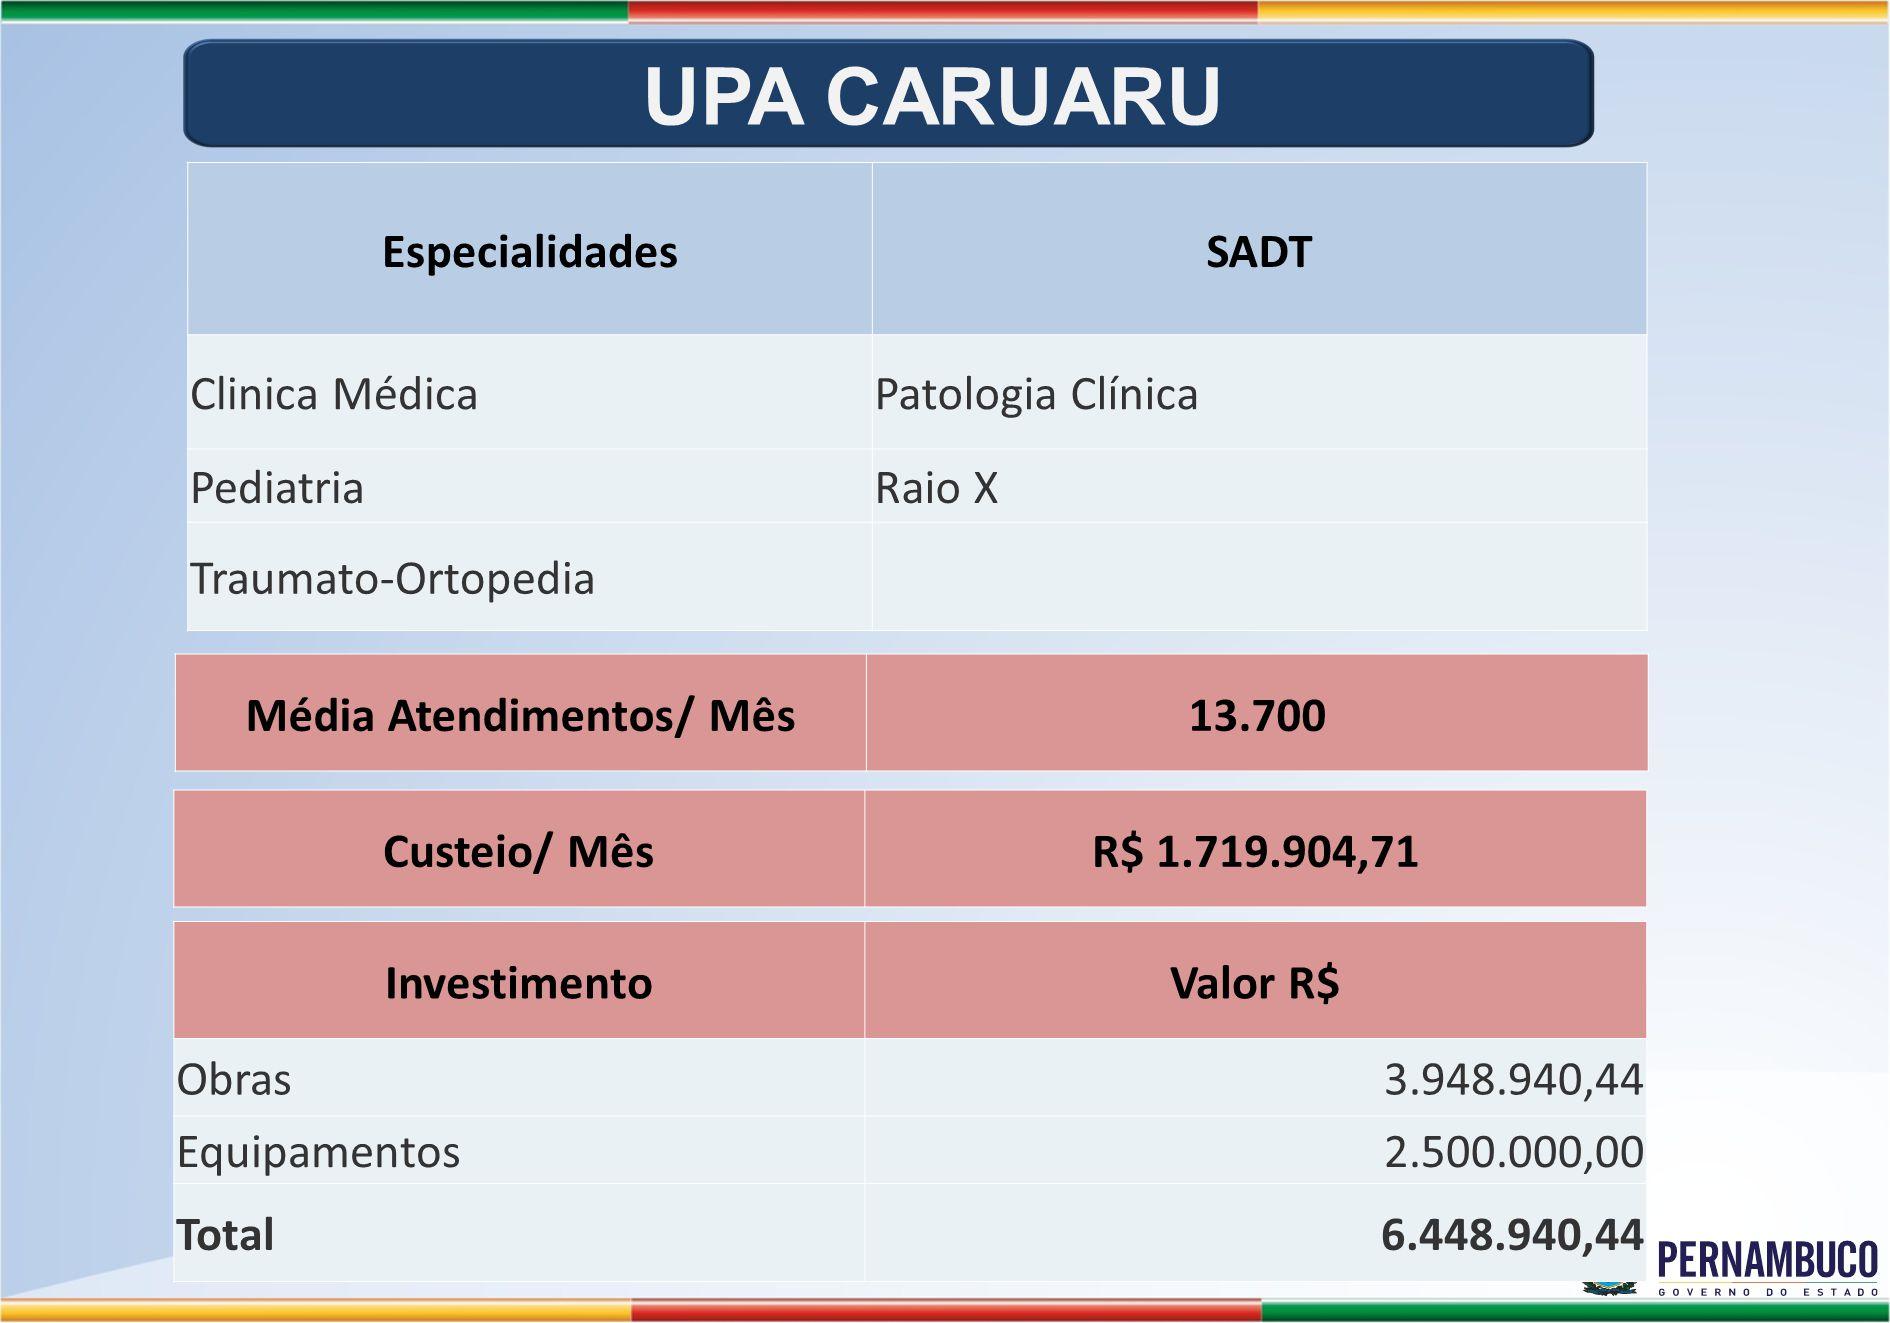 EspecialidadesSADT Clinica MédicaPatologia Clínica PediatriaRaio X Traumato-Ortopedia InvestimentoValor R$ Obras3.948.940,44 Equipamentos2.500.000,00